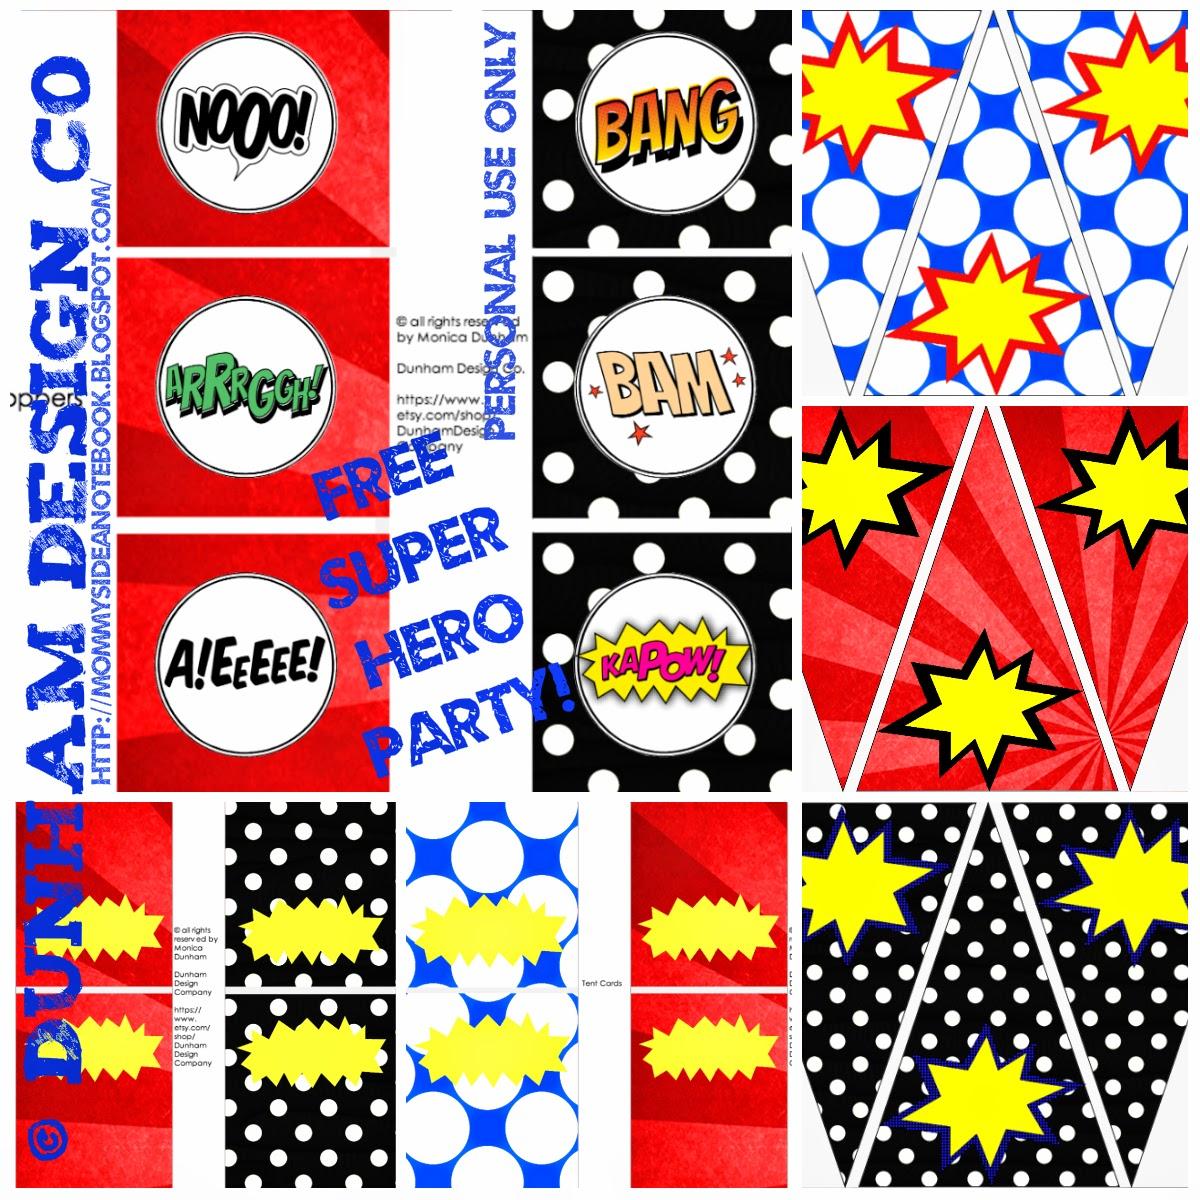 Dunham Design Company Superhero Party Printable Freebie